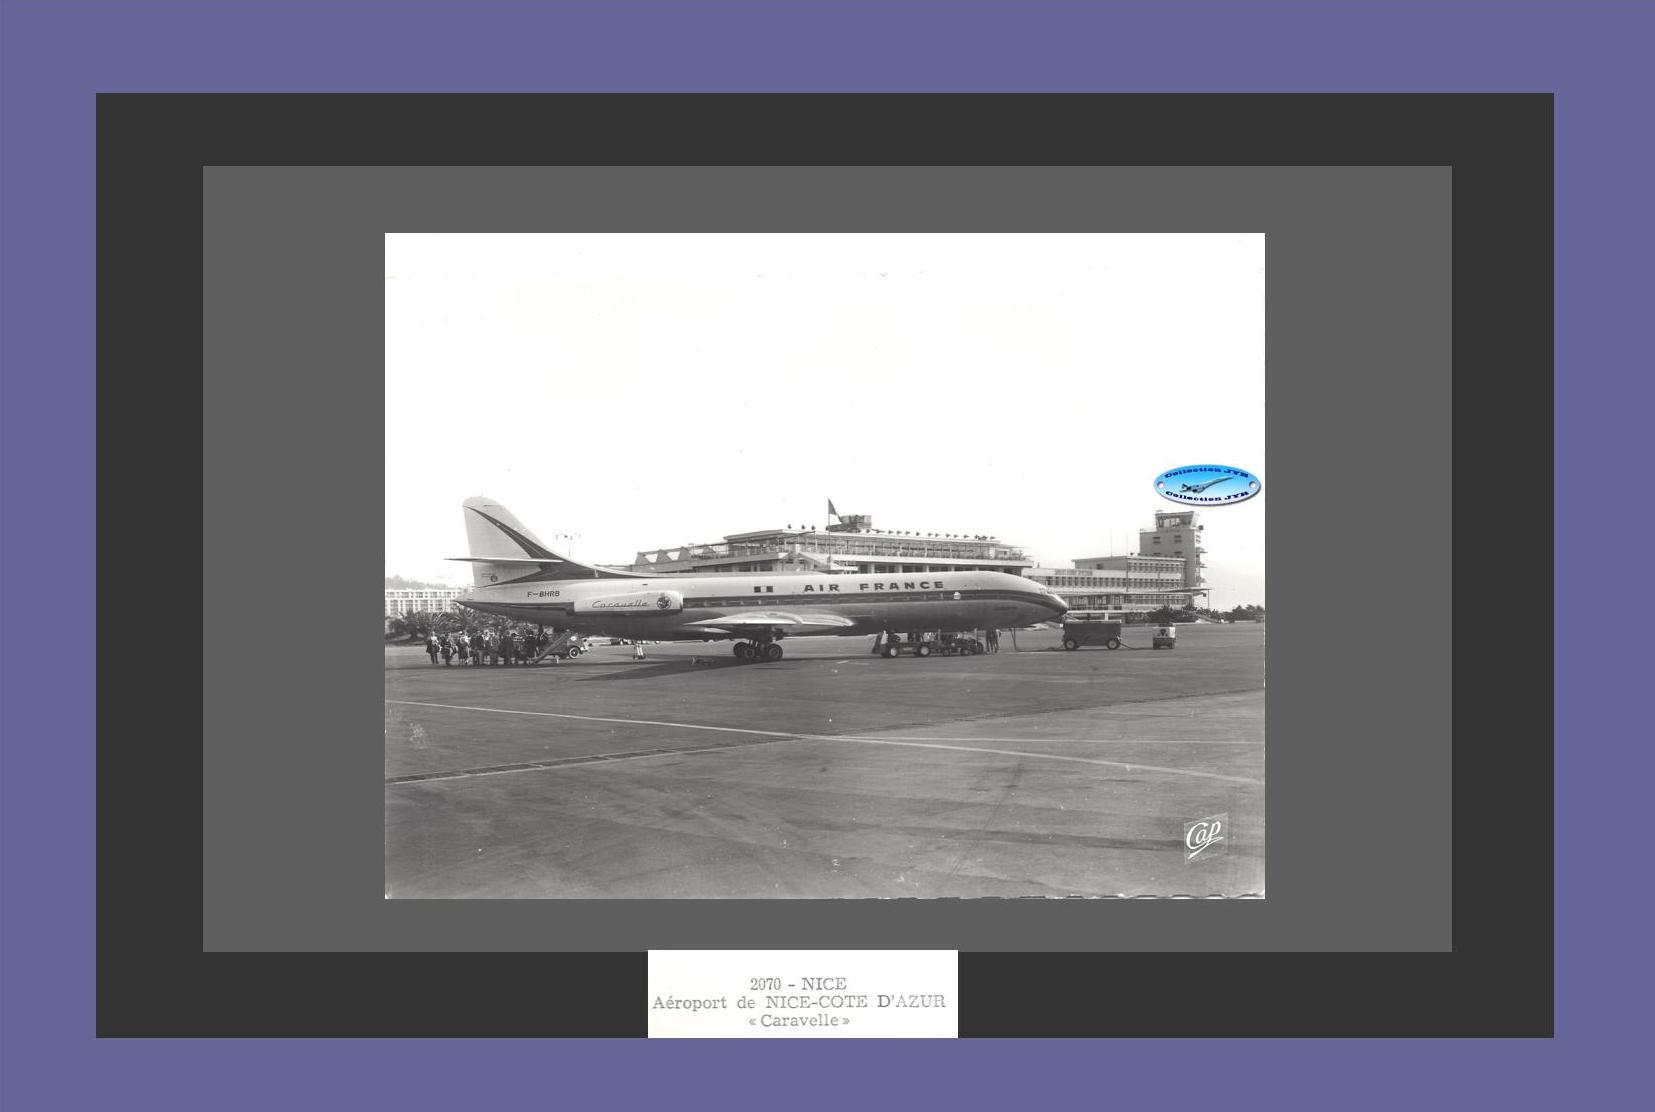 Web - Carte Postale Caravelle Air France F-BHRB Nice Réf 2070 Composition